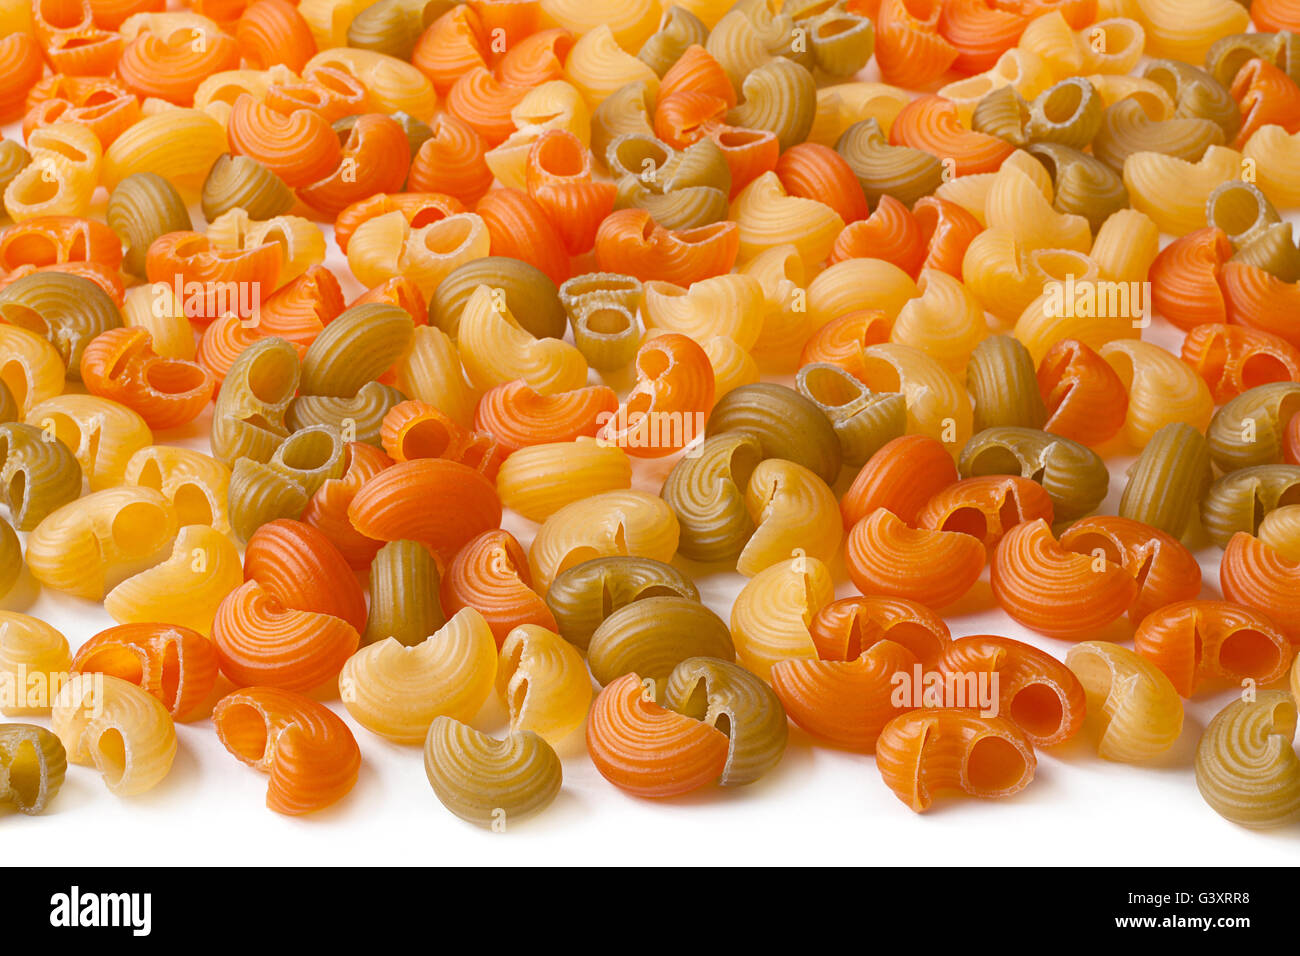 Multicolor dry swirl pasta closeup background - Stock Image